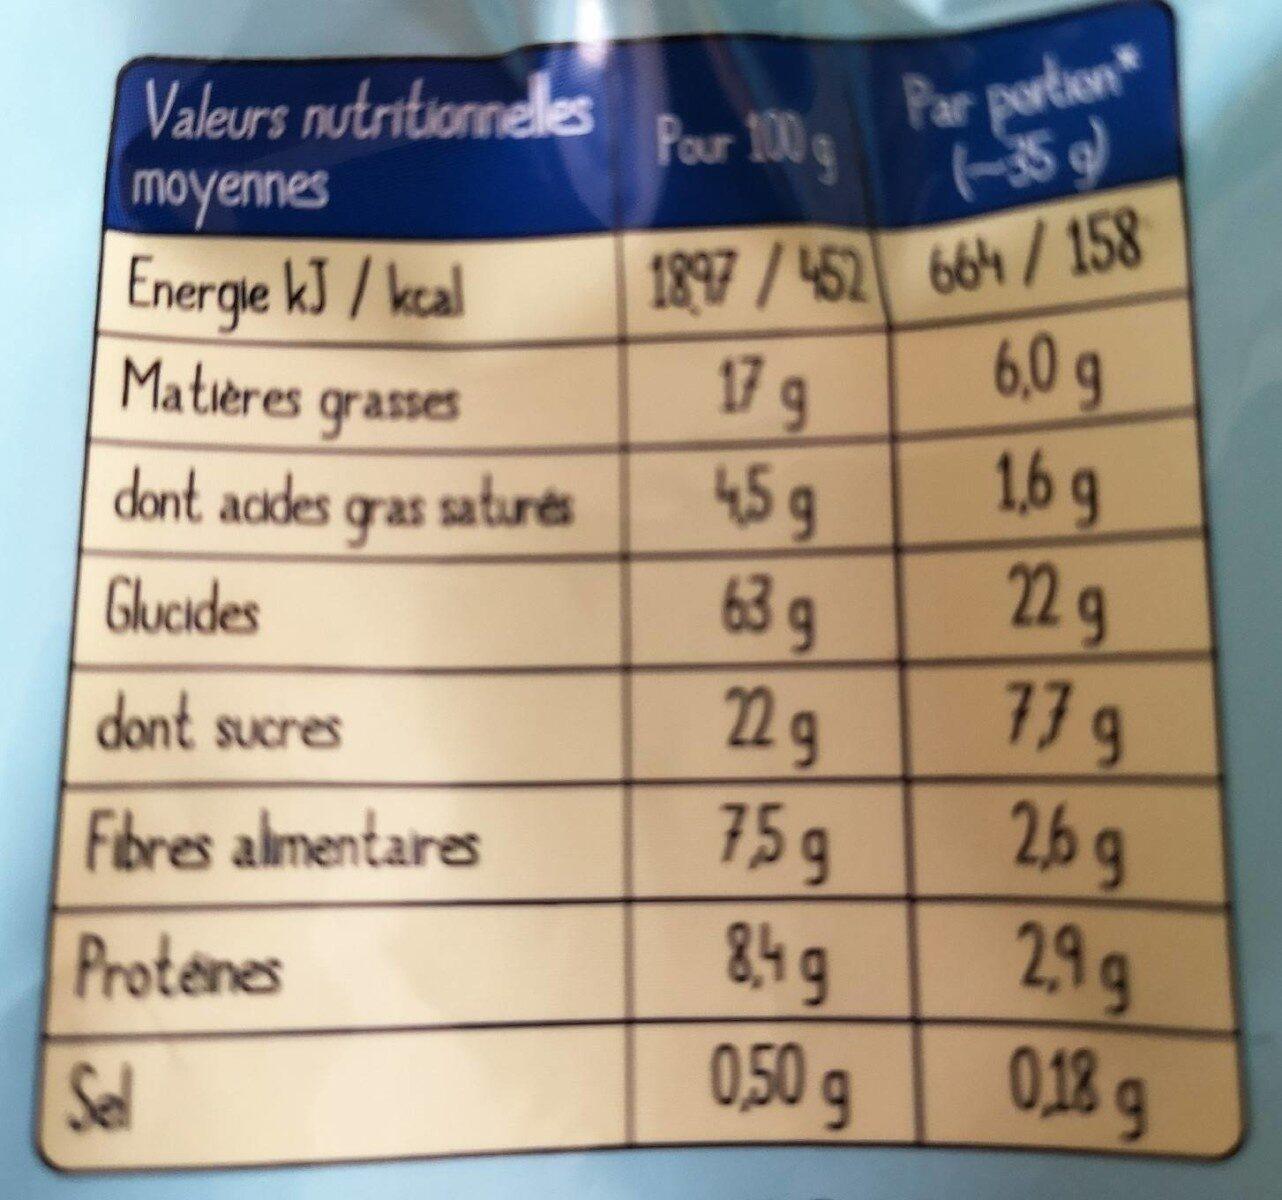 Muesli croustillant au chocolat - Nutrition facts - fr